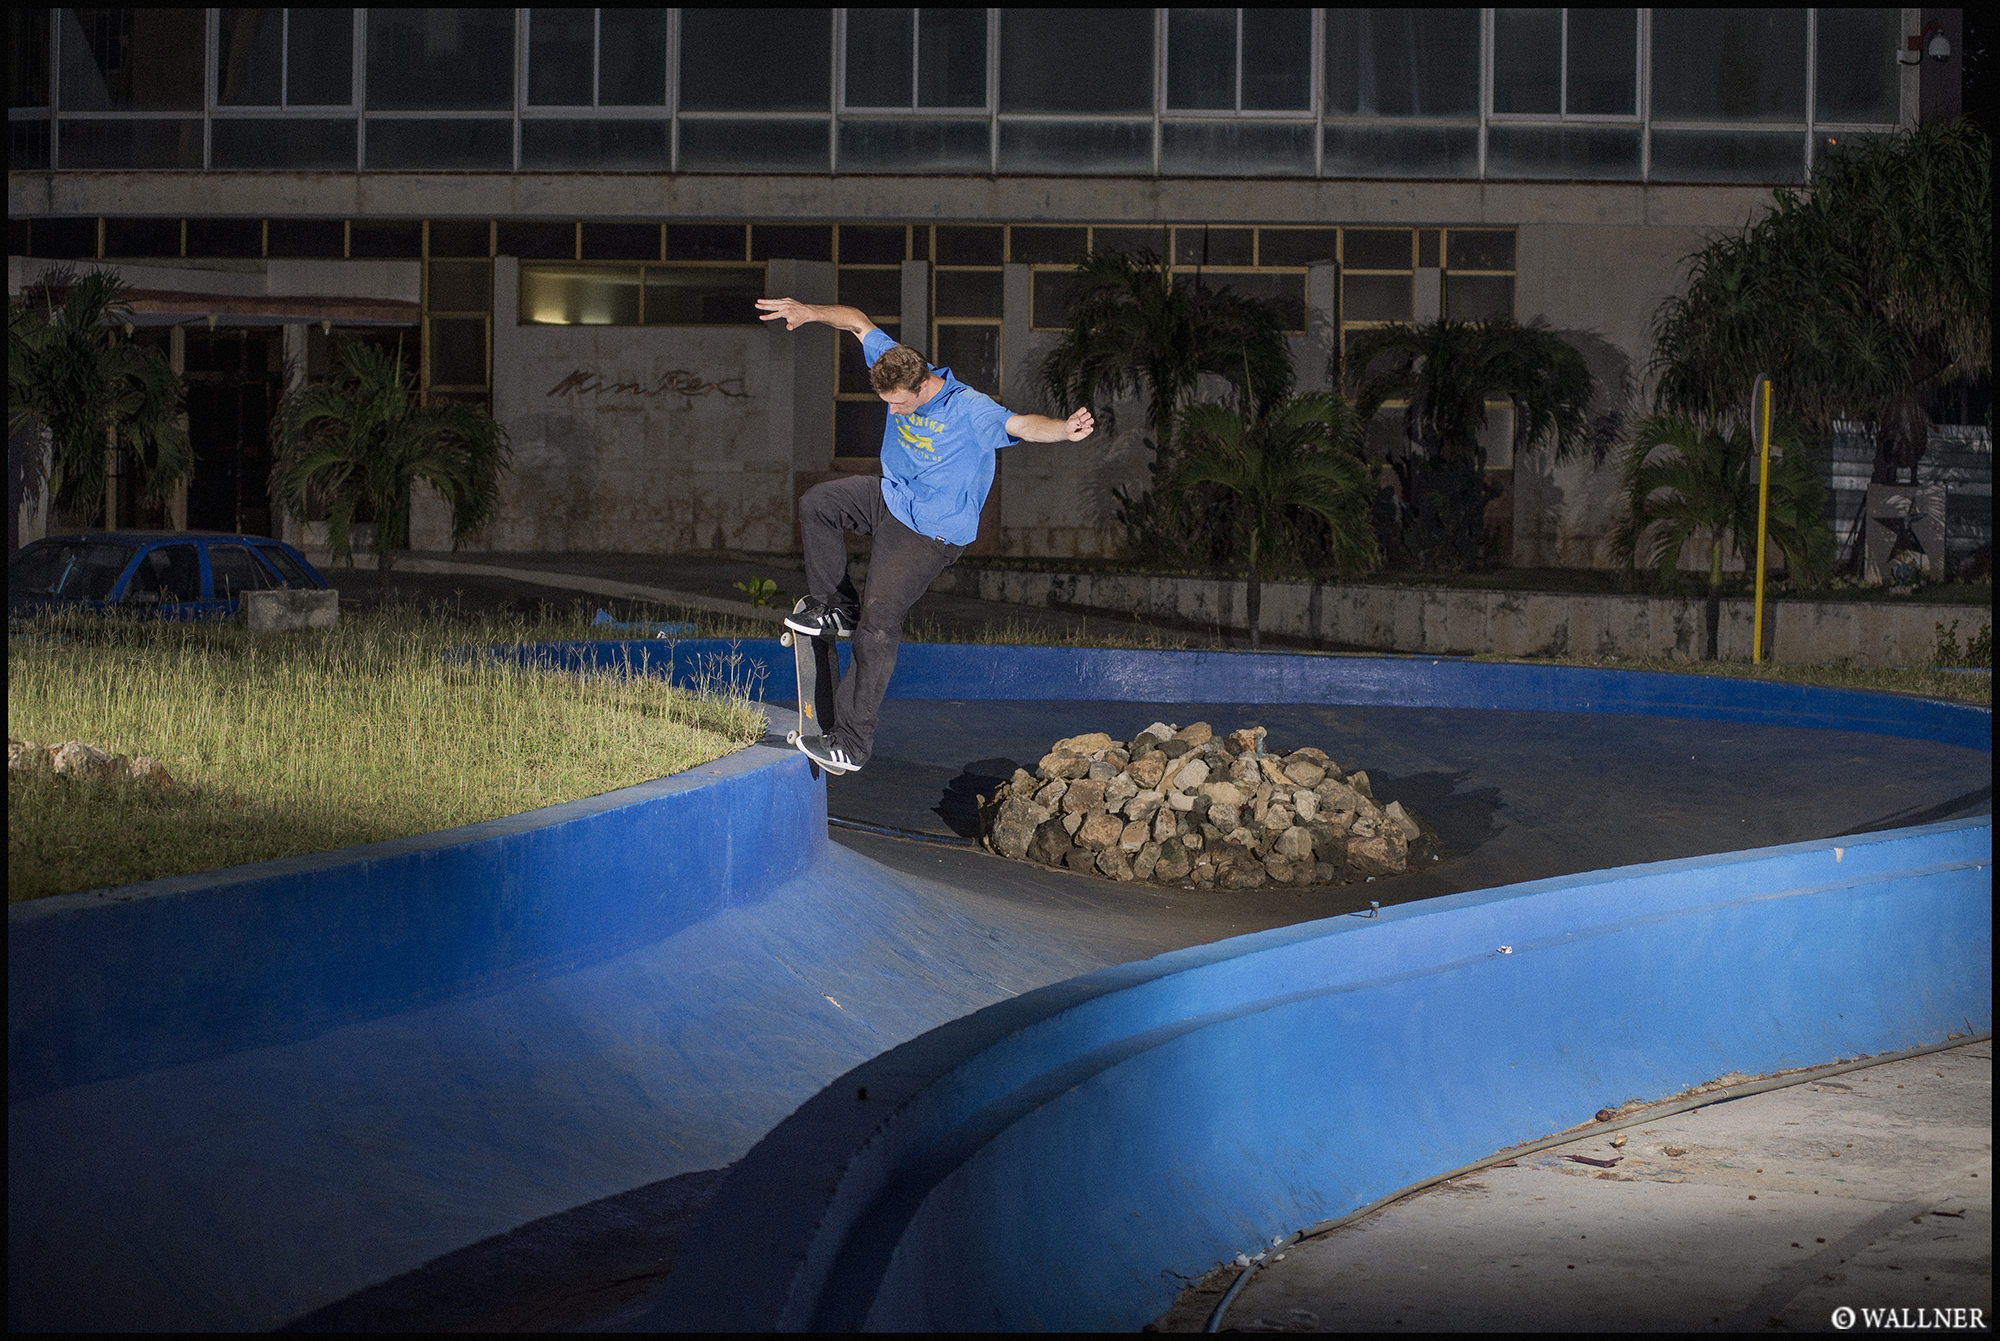 Digital Patrik Wallner Havana Walker Nosegrind Blue Banks LOWQ 2000P w WM